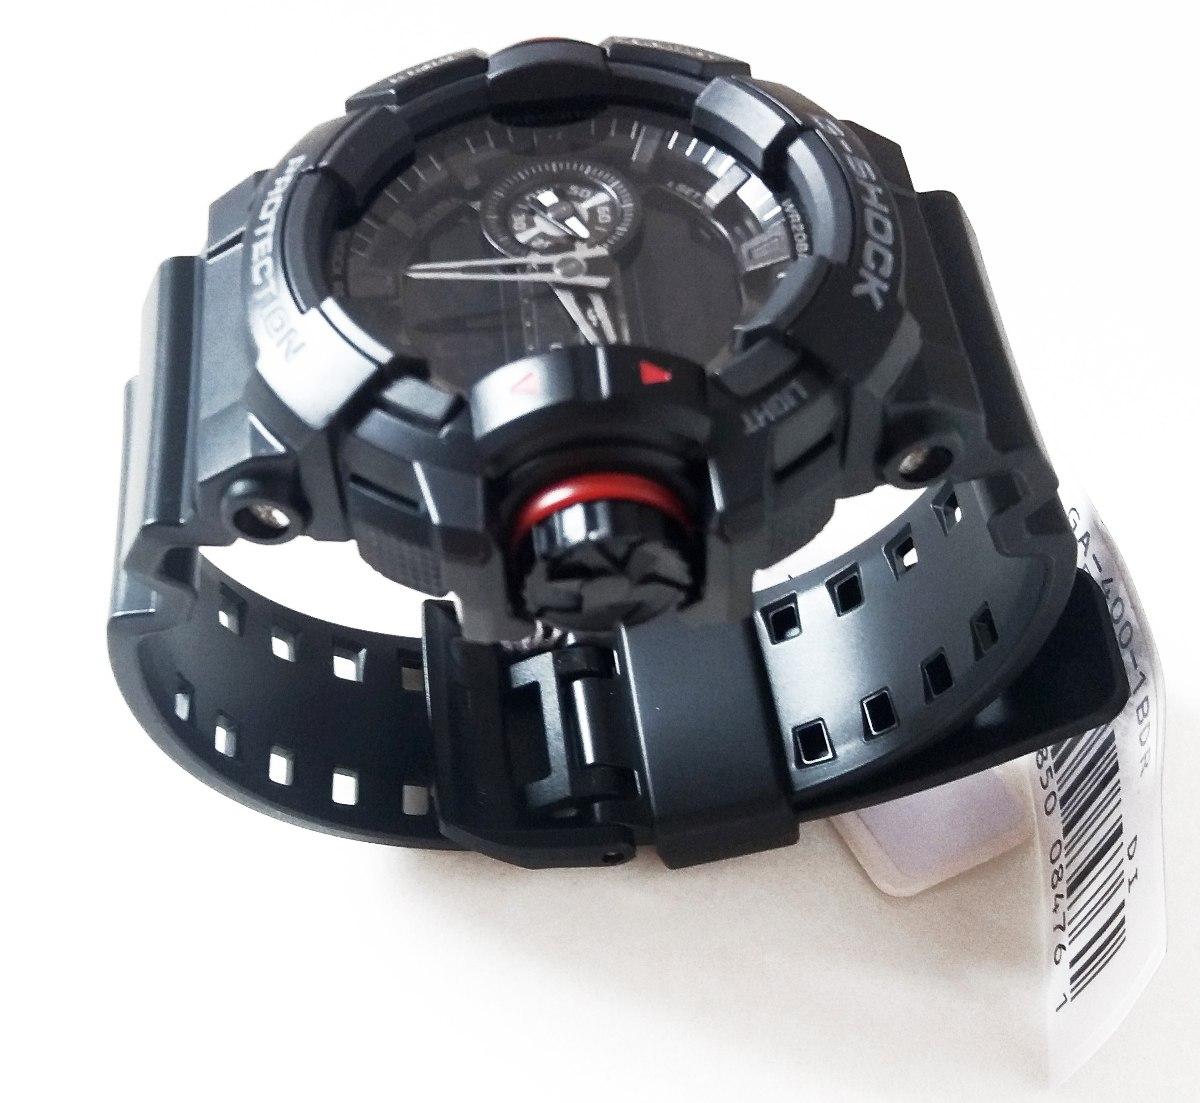 7aeddbf3849 relógio masculino anadigi casio g-shock ga400 pronta entrega. Carregando  zoom.